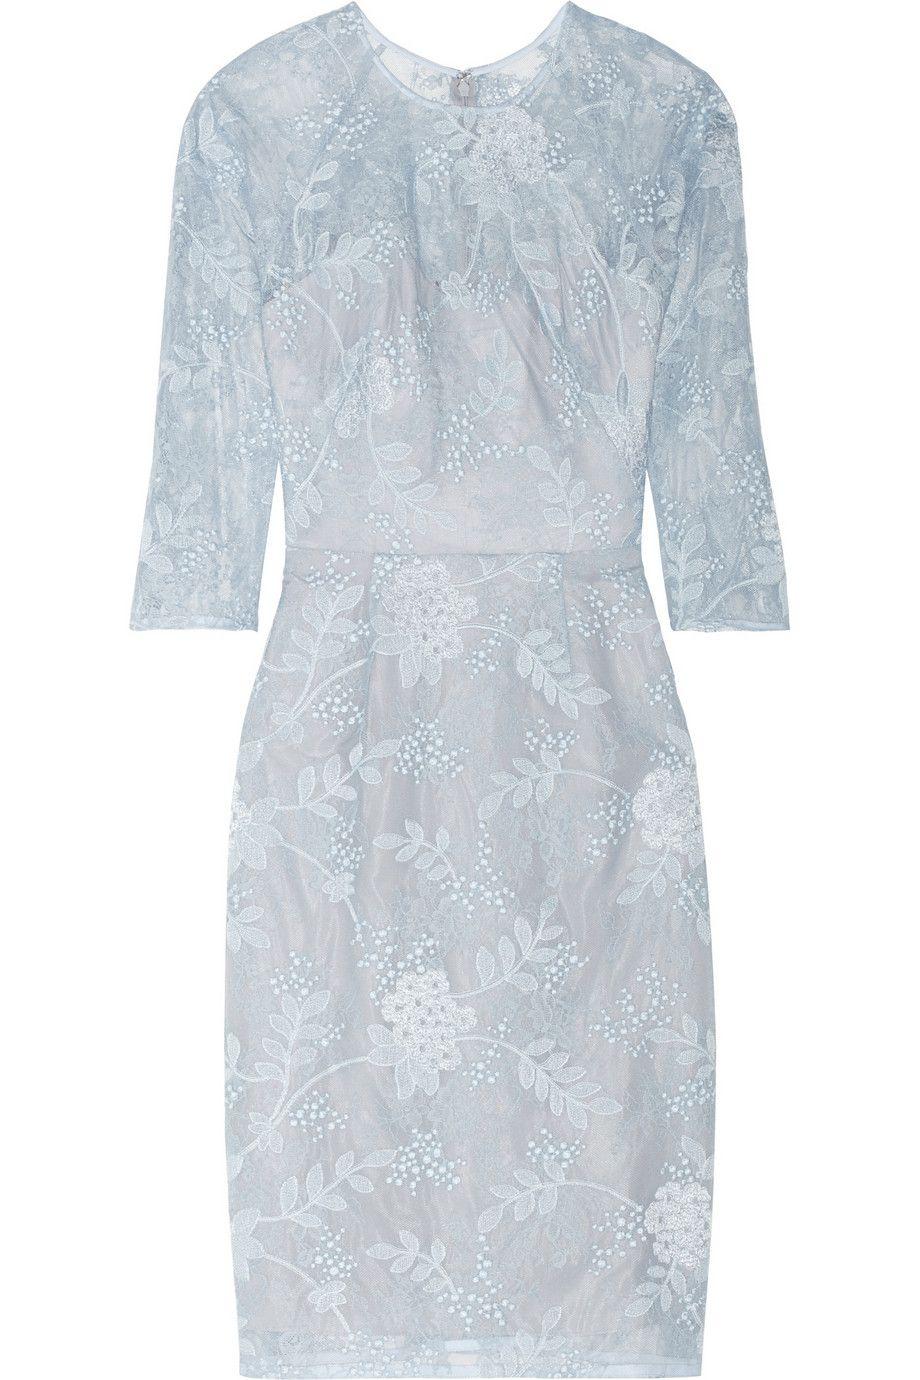 Royal blue lace dress styles  Lela Rose  Chantilly lace dress  NETAPORTERCOM  Looks Iud Love